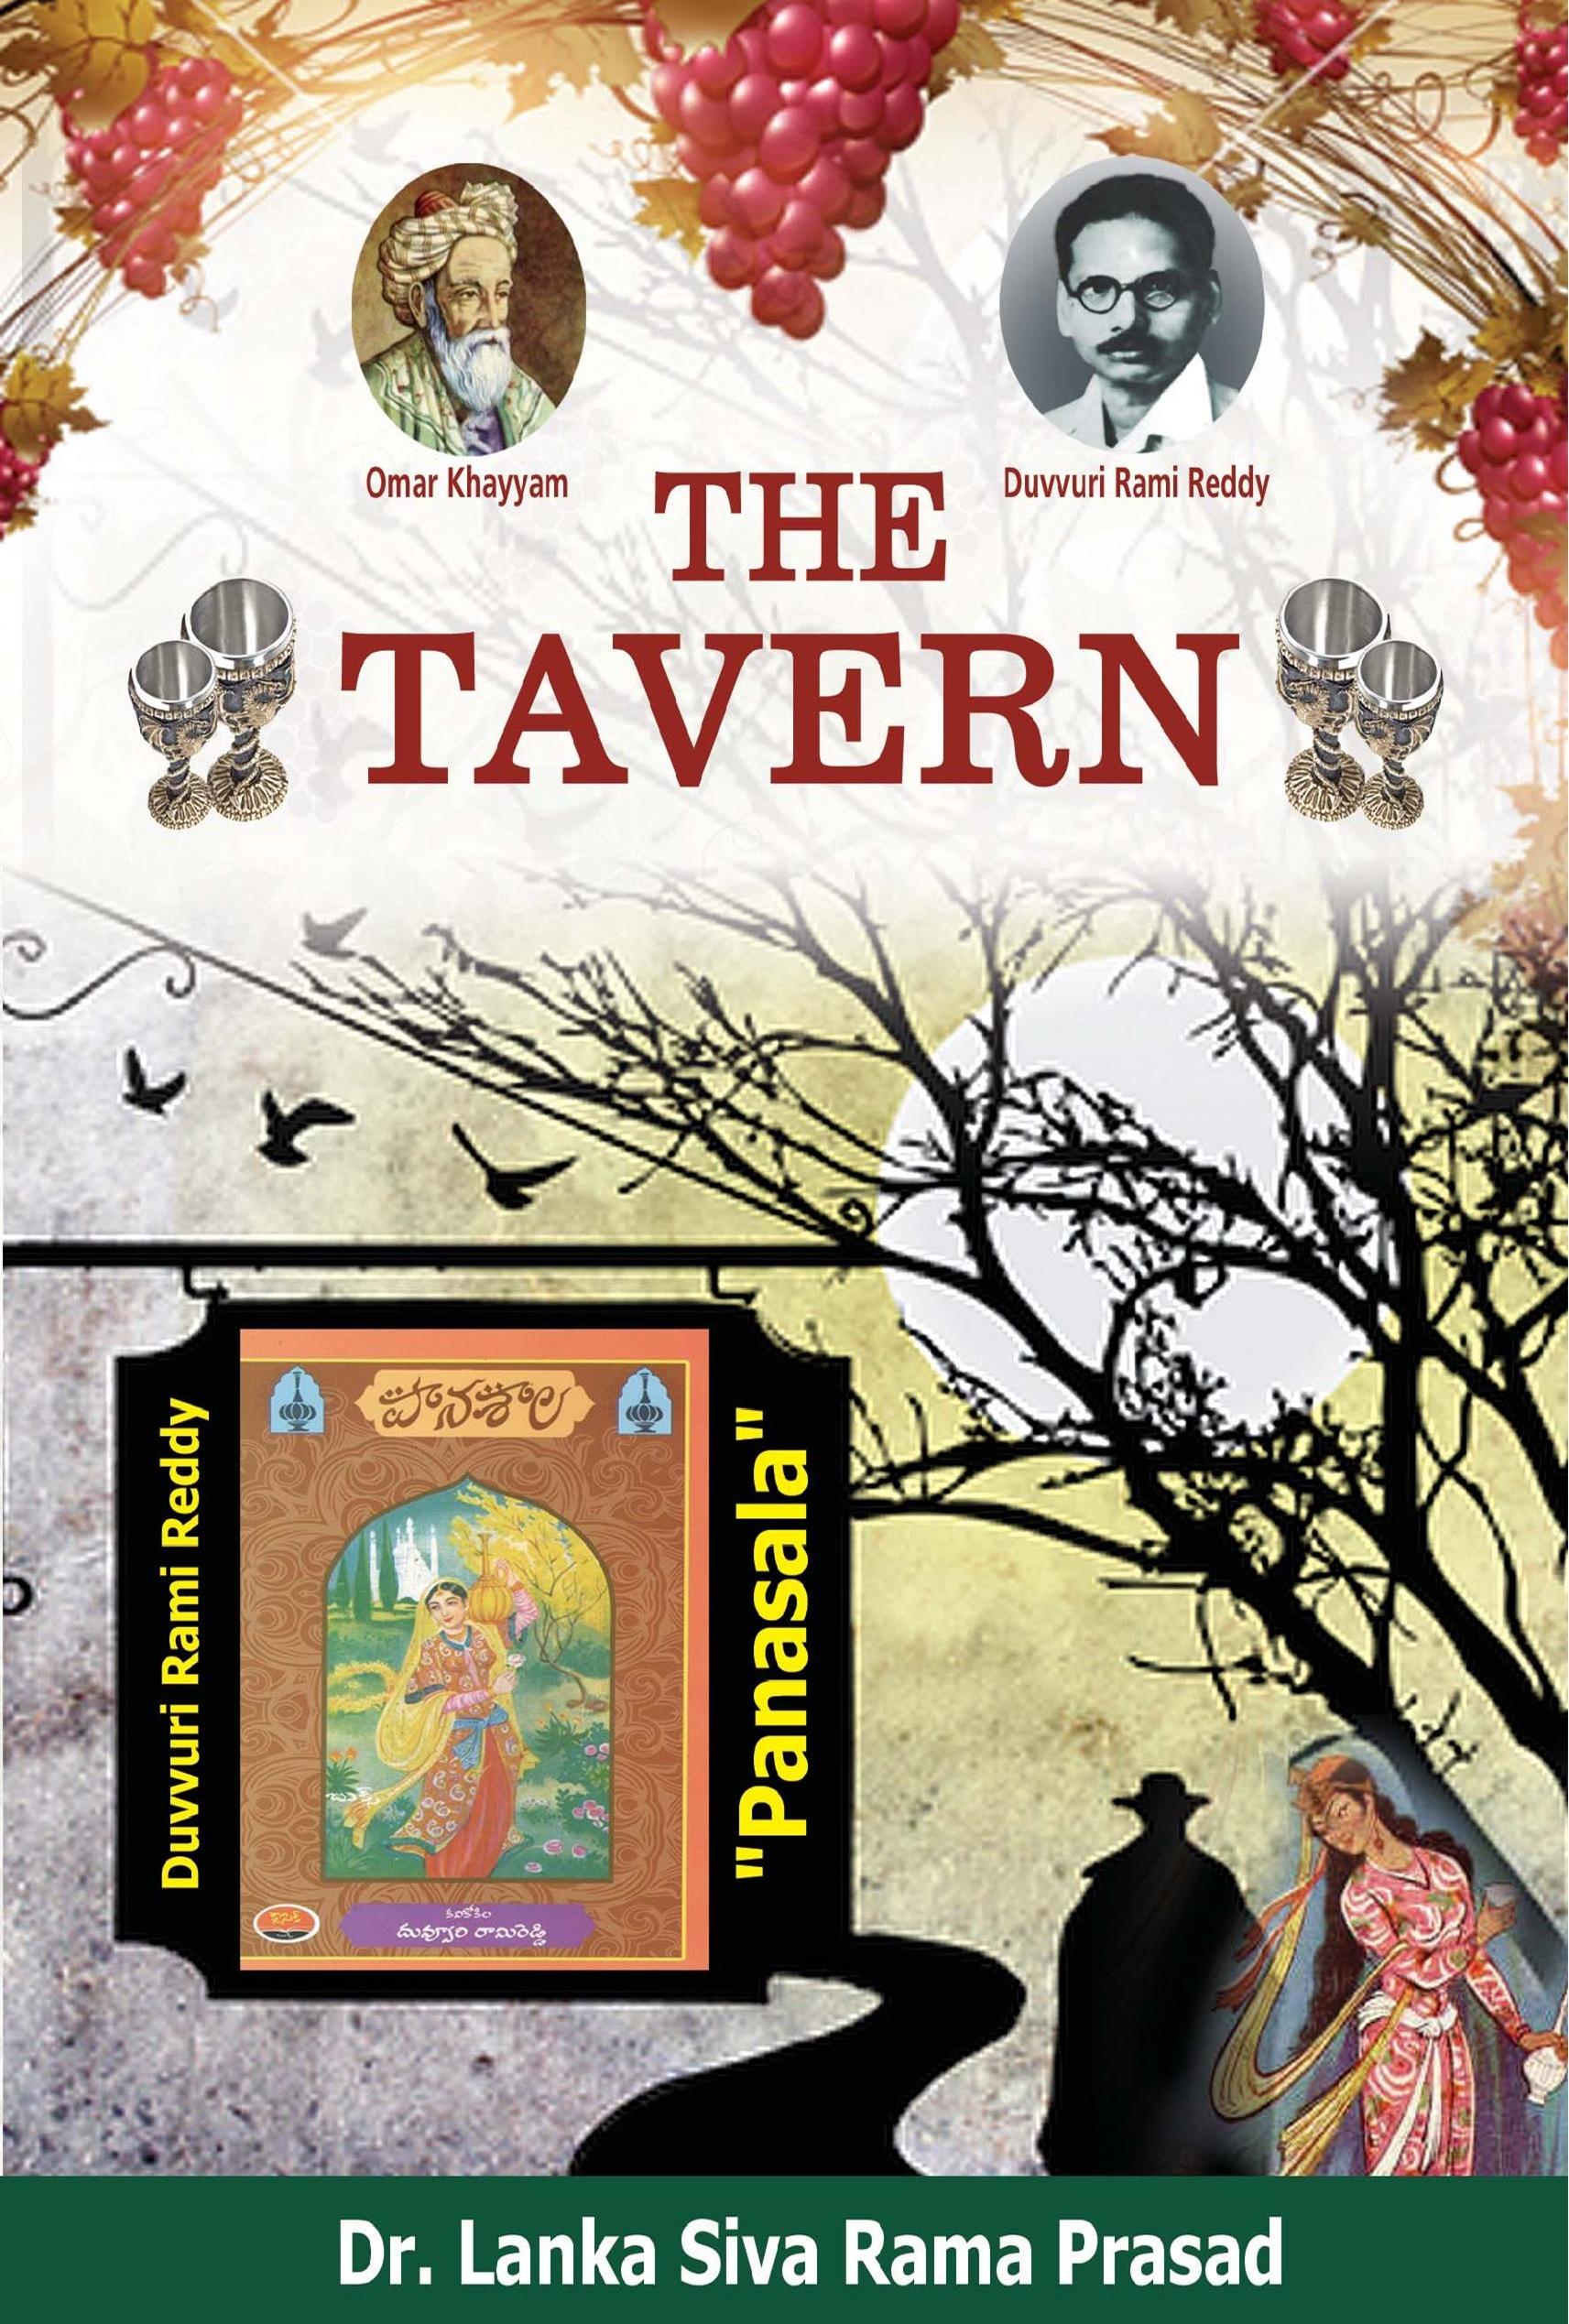 The Tavern (Duvvuri Rami Reddy's Panasala)